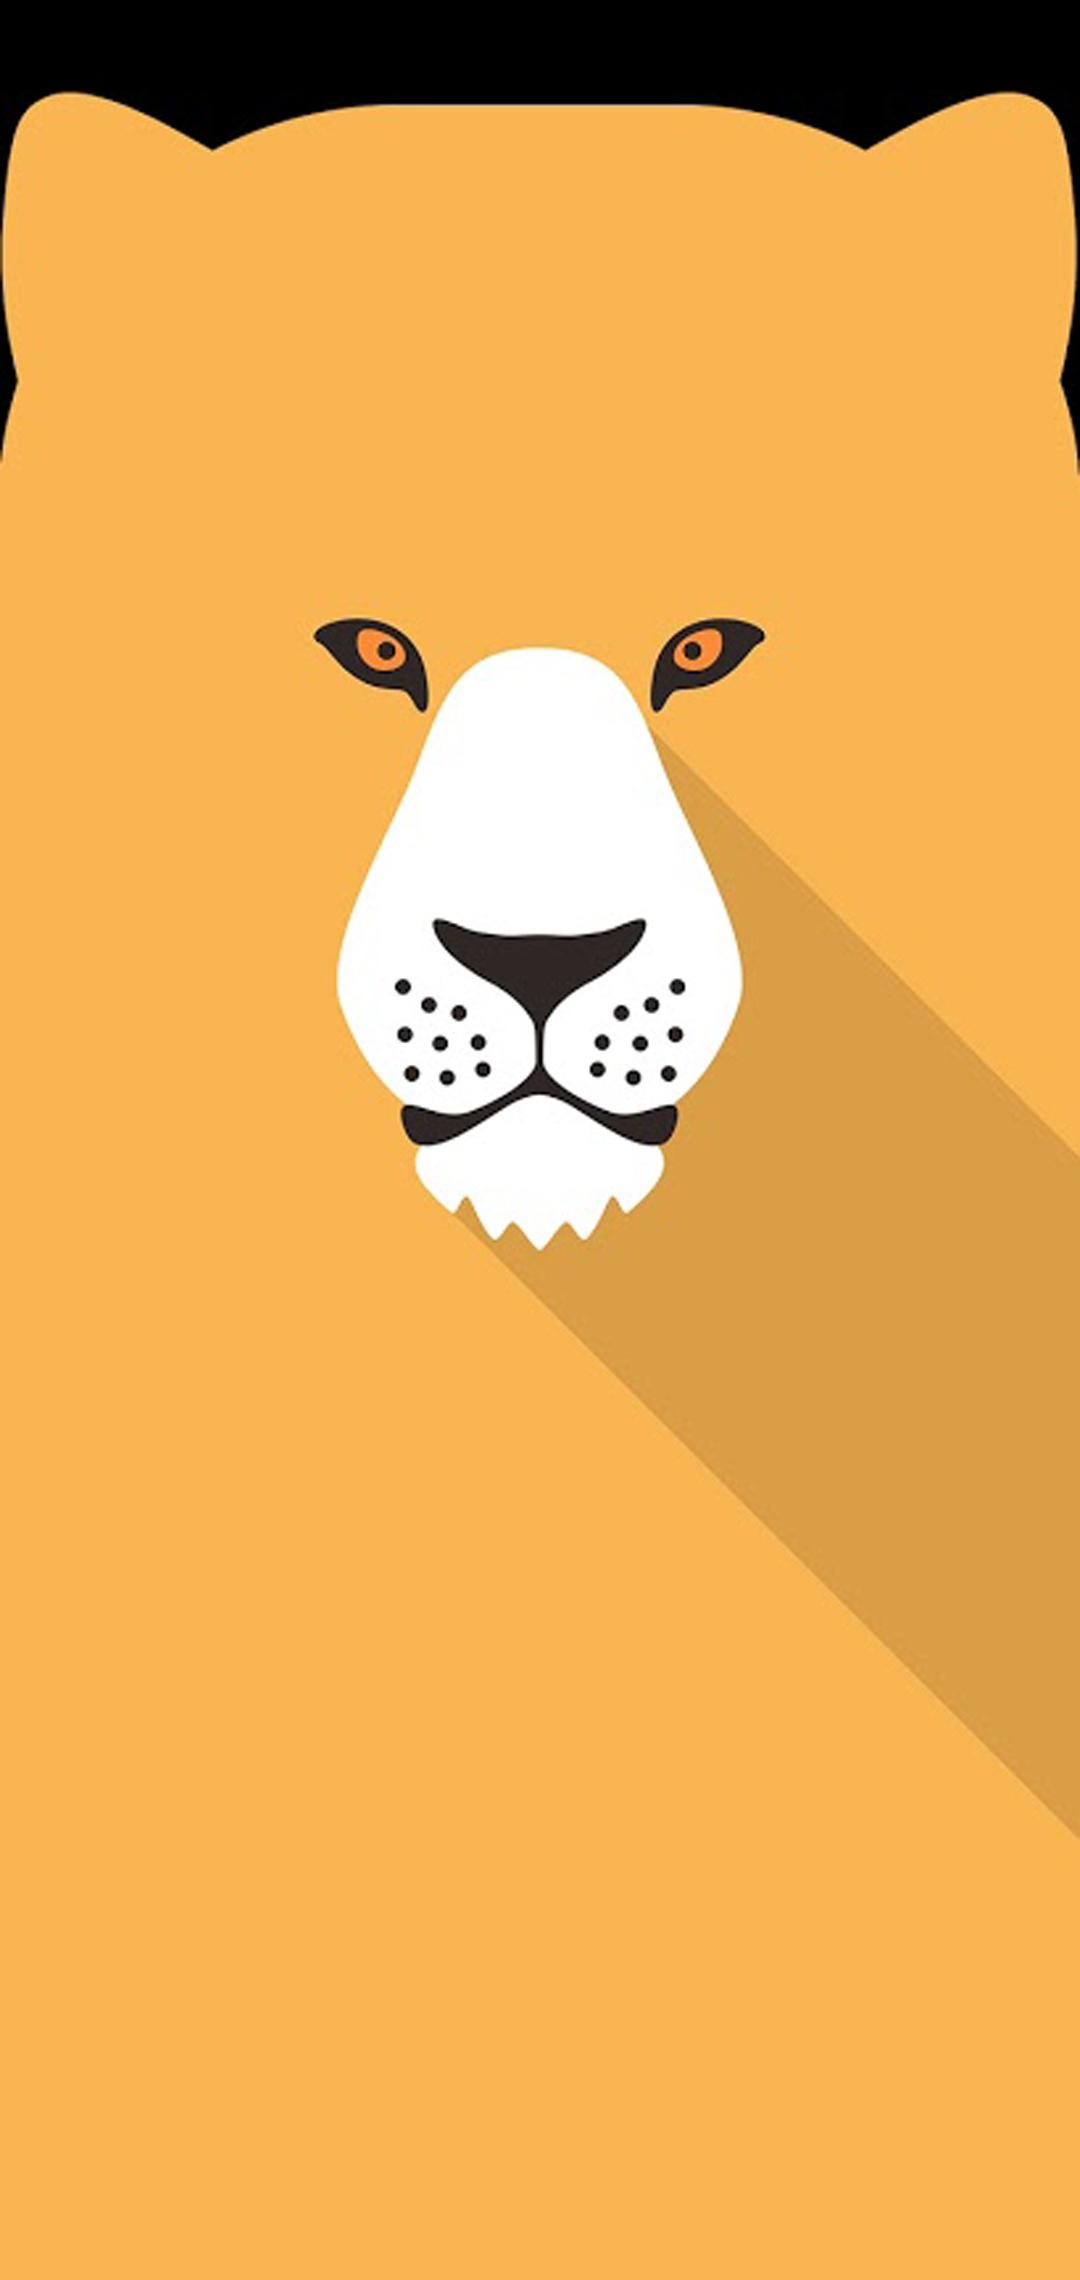 tiger caricature wallpaper